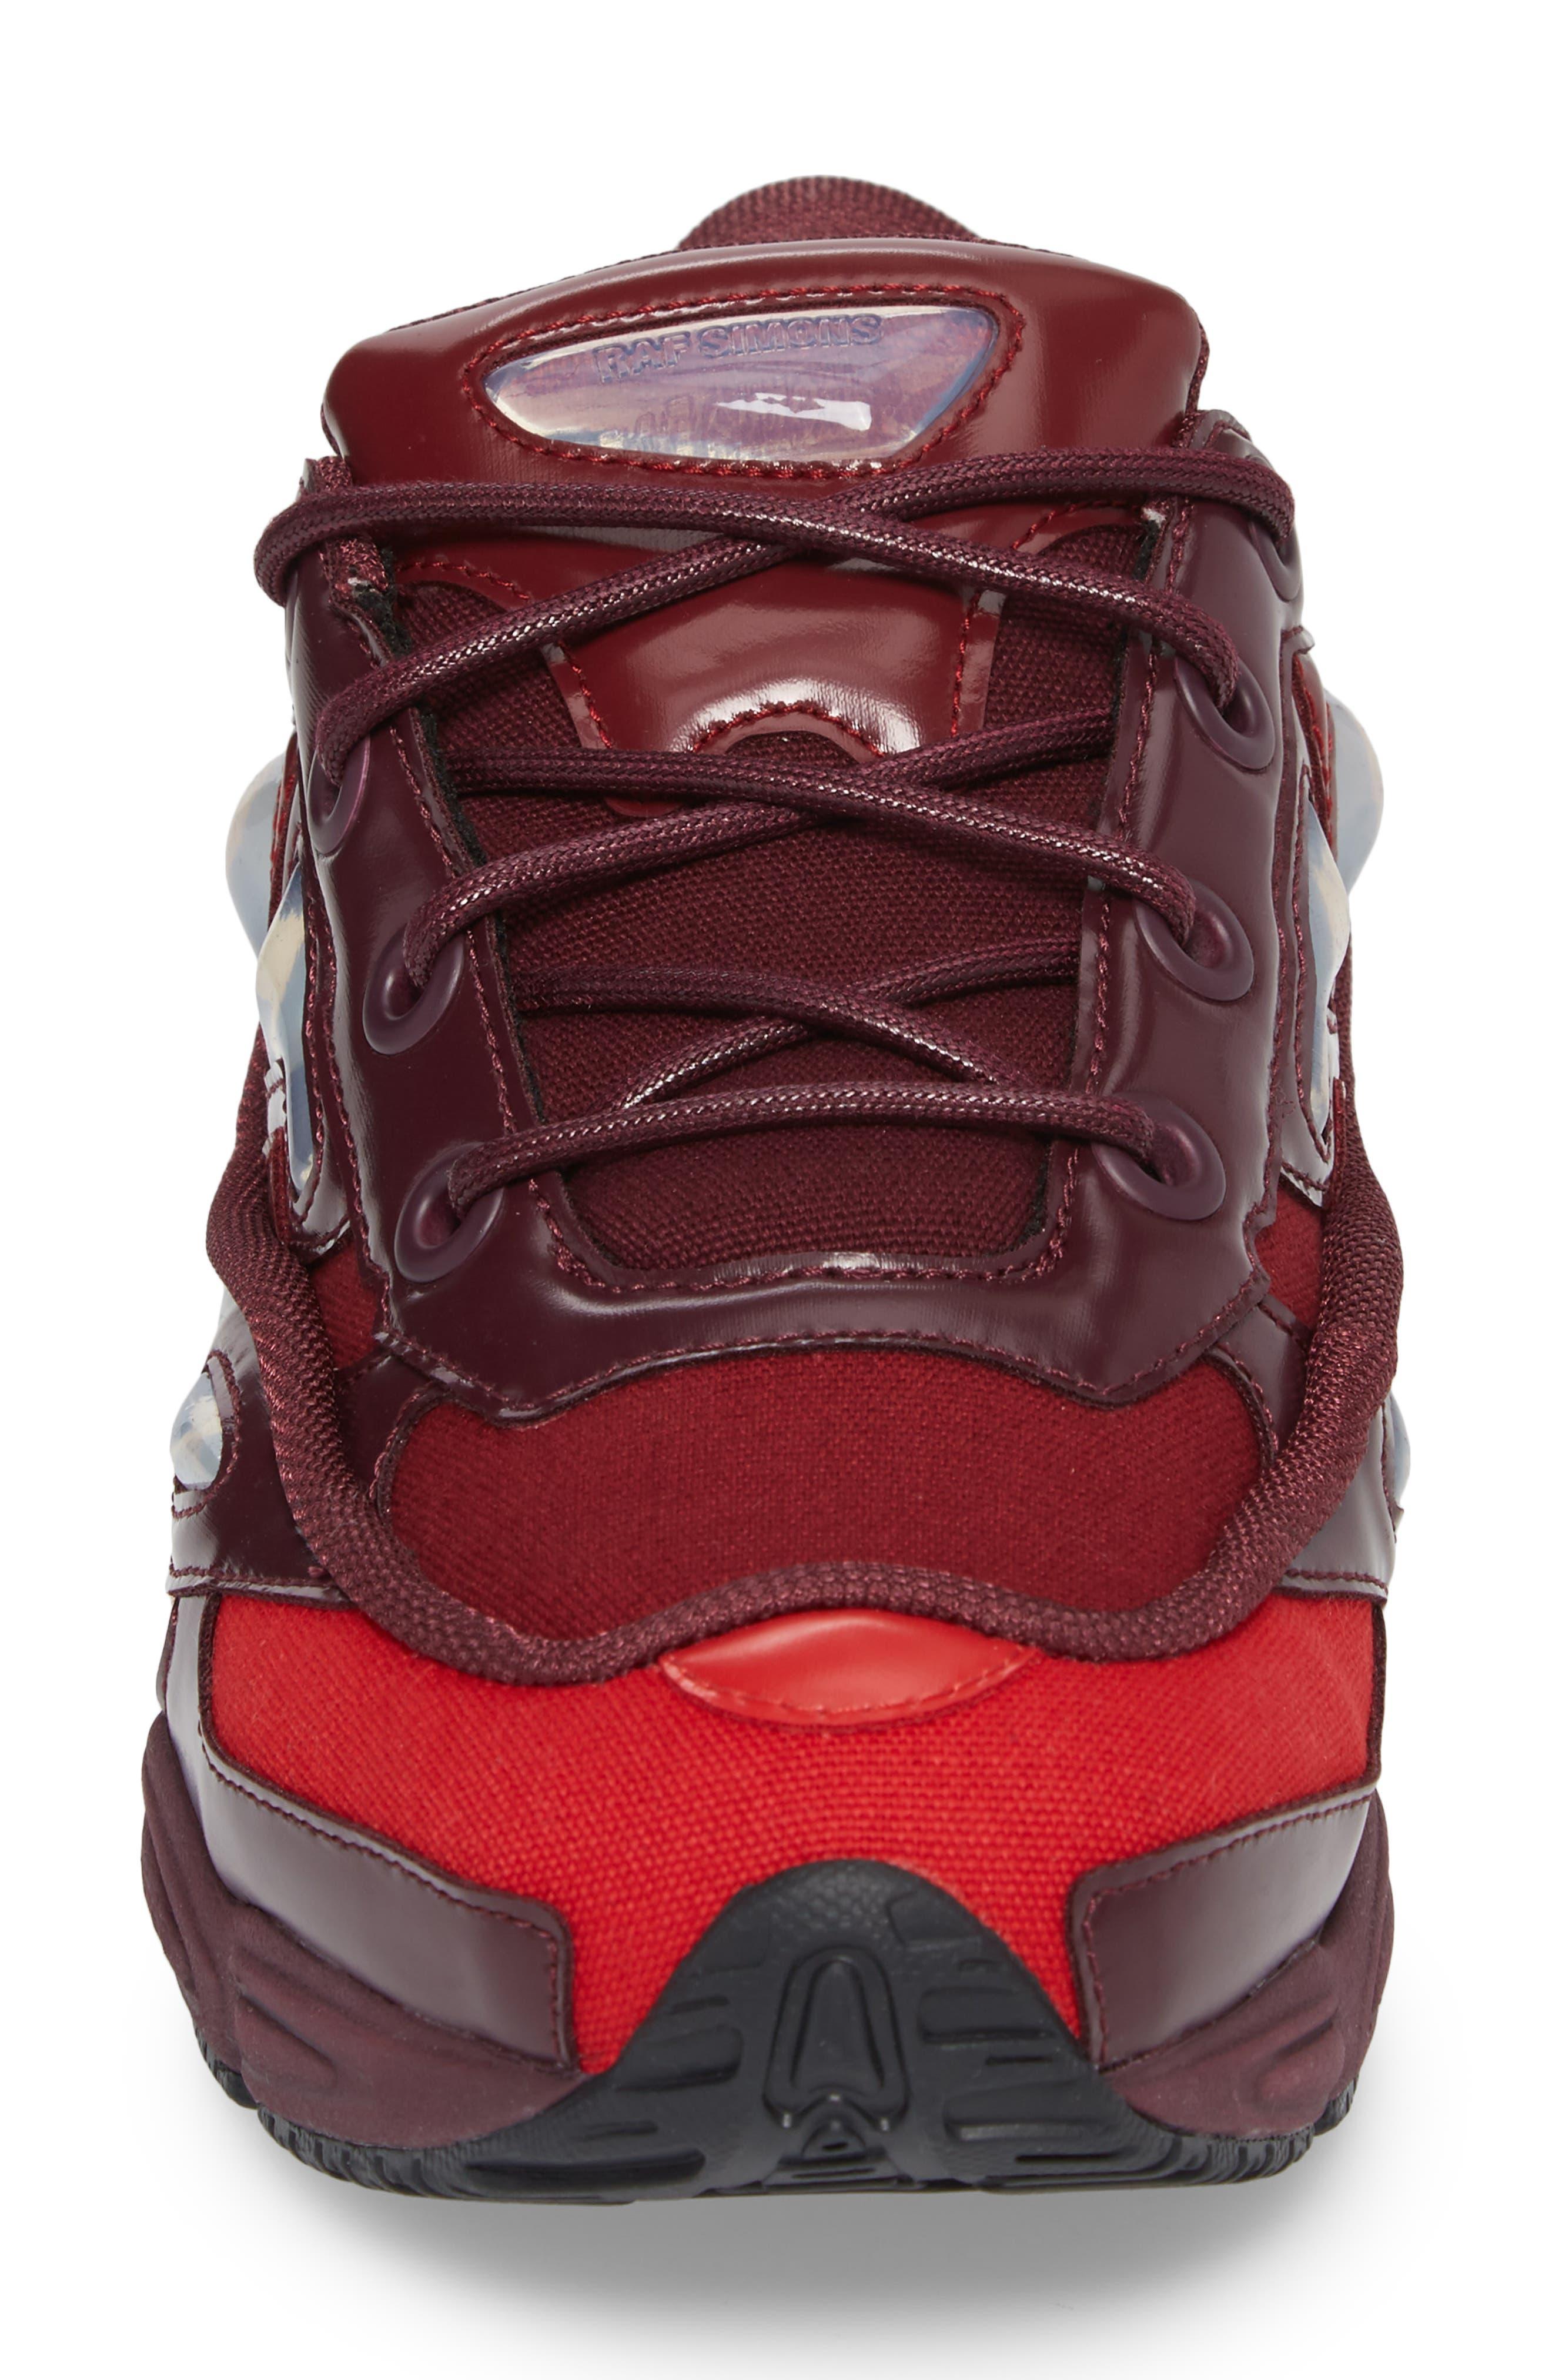 adidas by Raf Simons Ozweego III Sneaker,                             Alternate thumbnail 4, color,                             Burgundy/ Maroon/ Scarlet